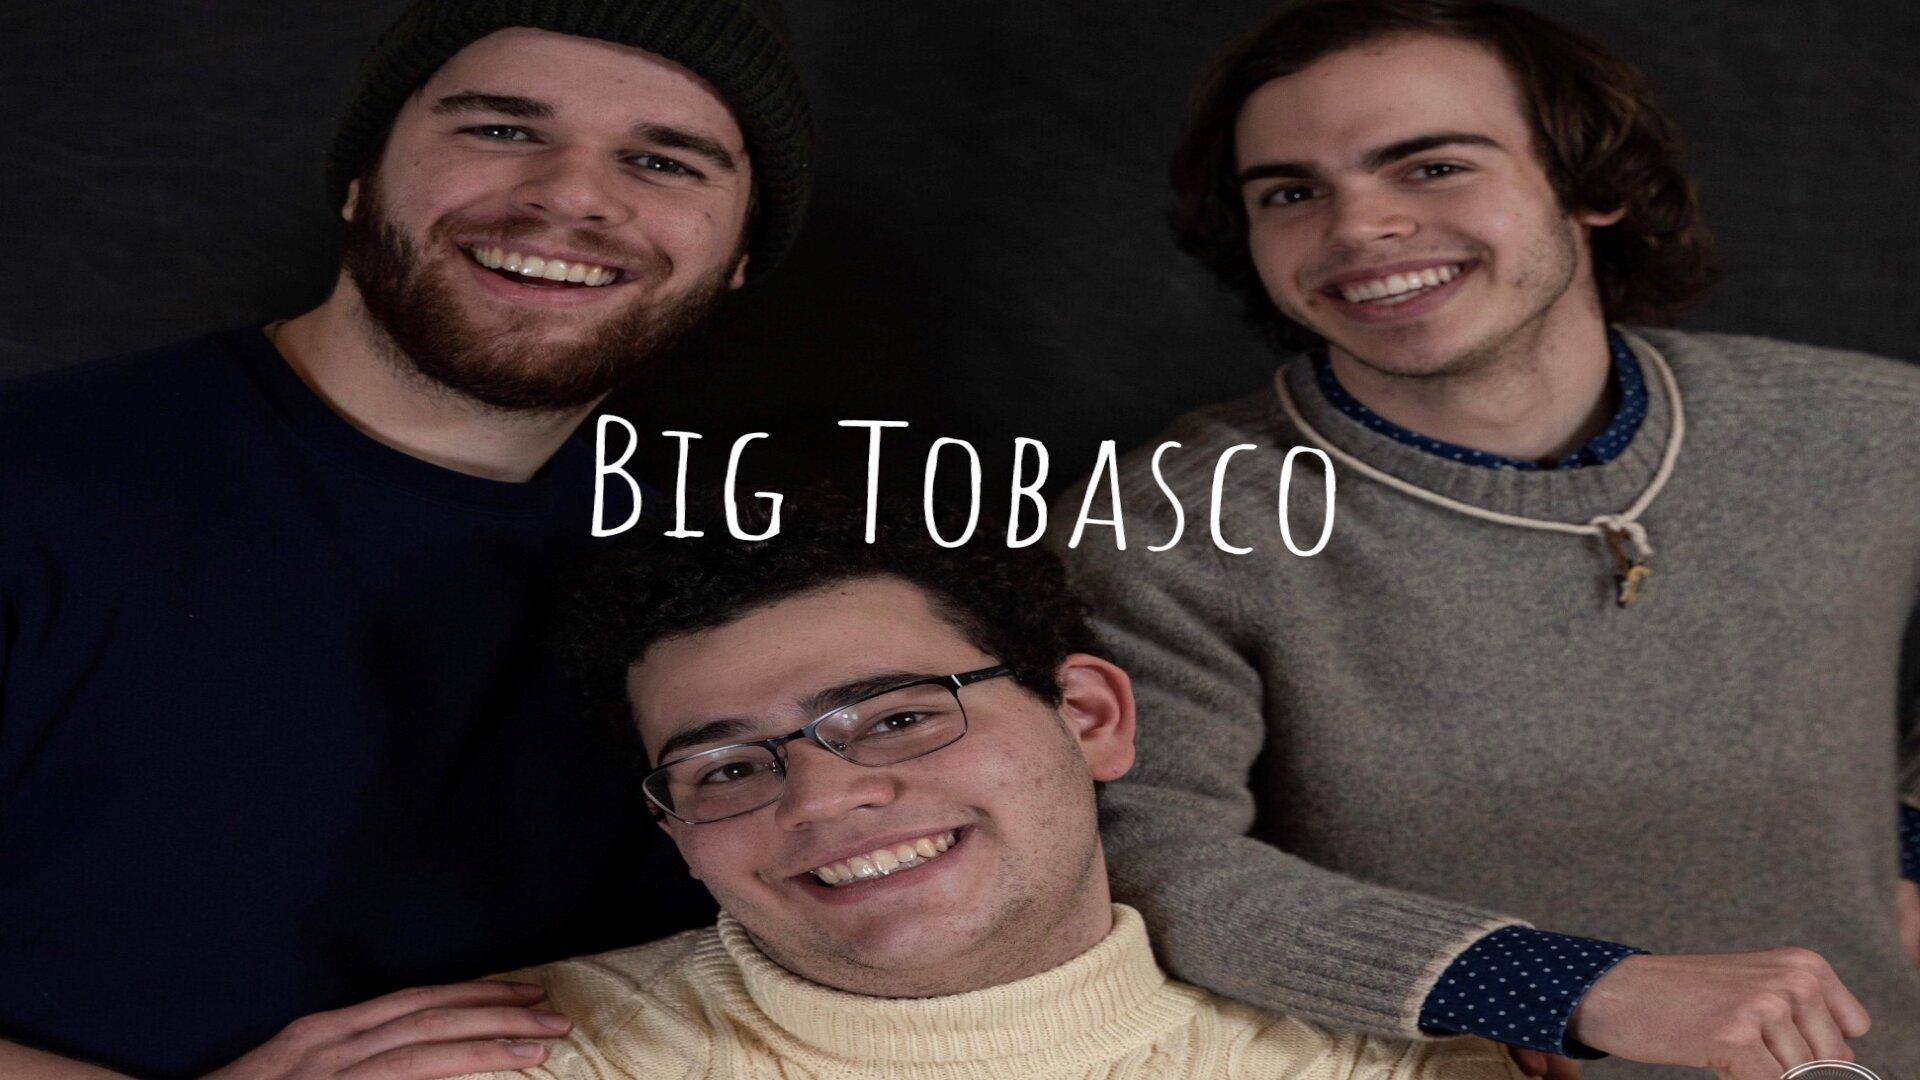 big tobasco 1920x1080 - Jake Schick.jpg